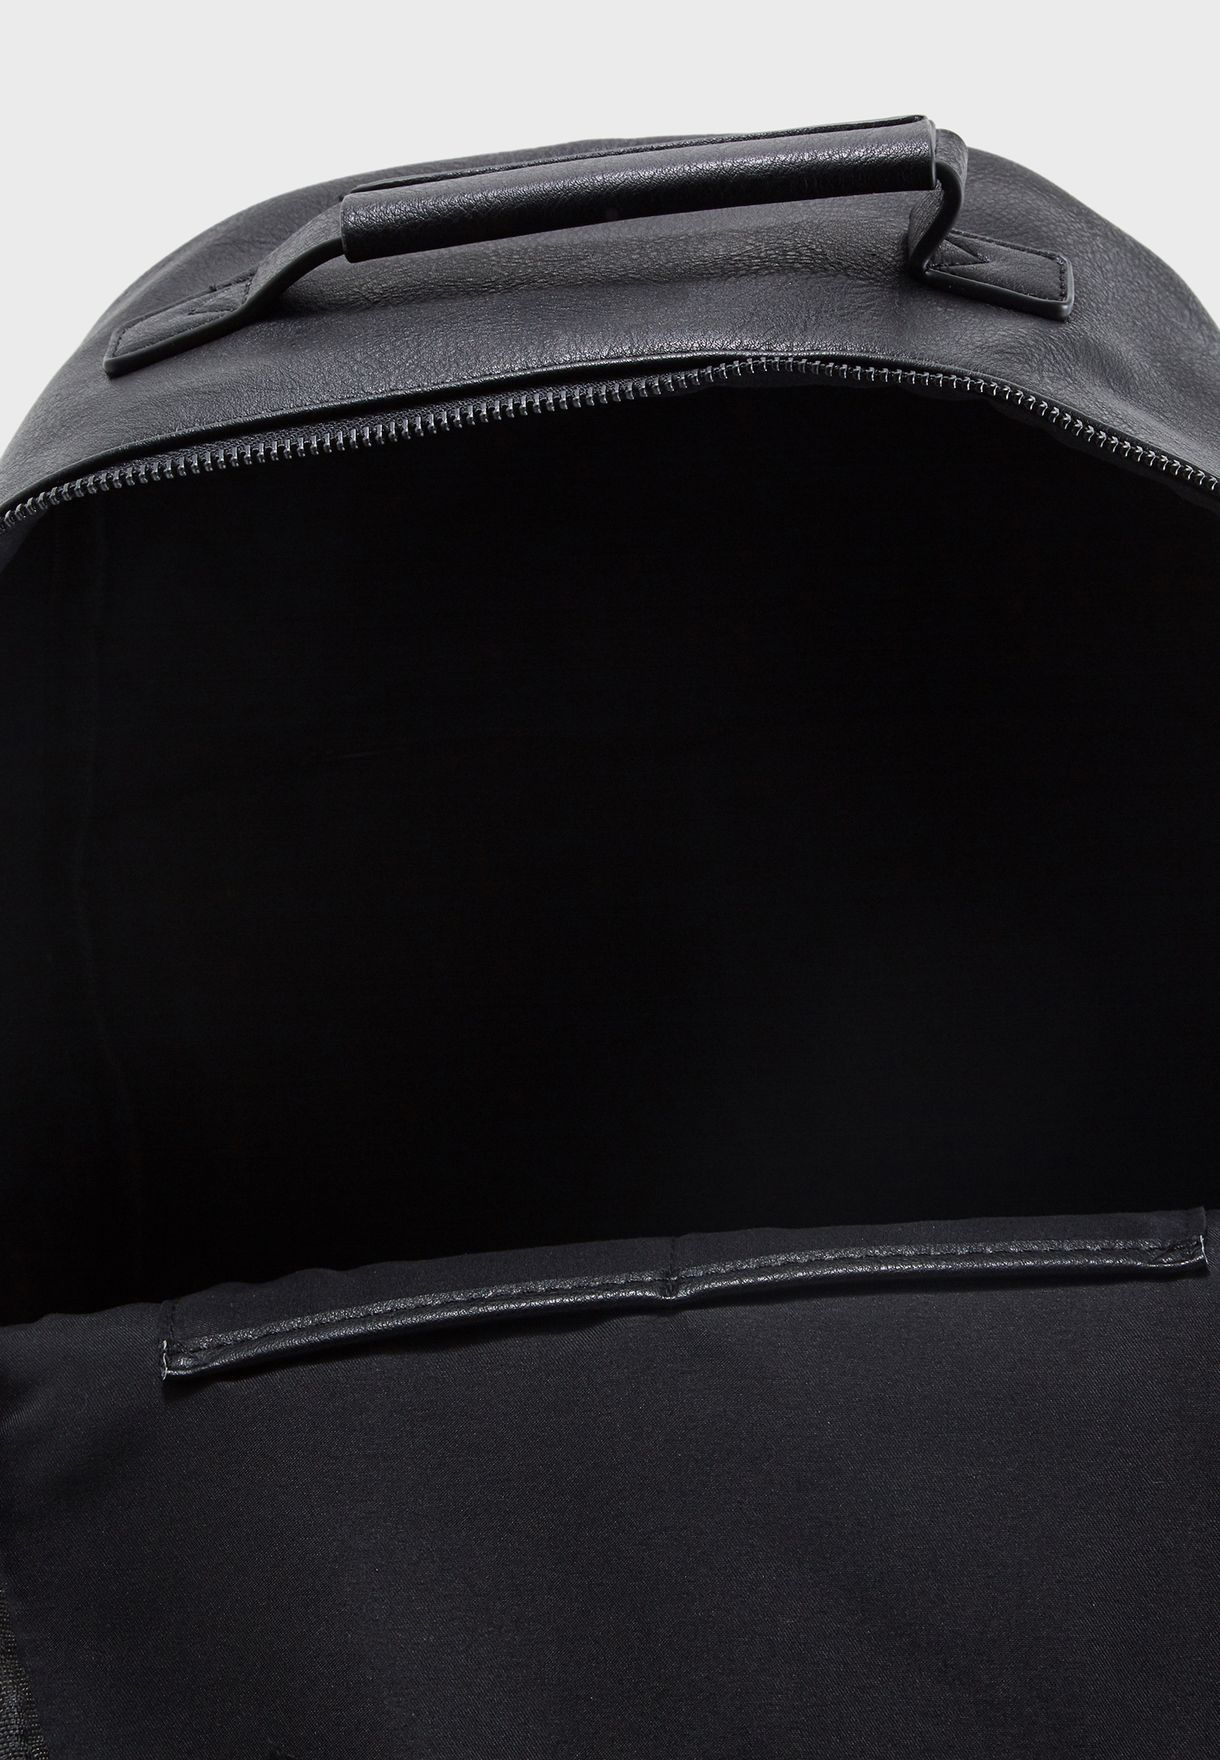 d77521584ce Shop Aldo black Agraella Backpack AGRAELLA99 for Men in UAE ...